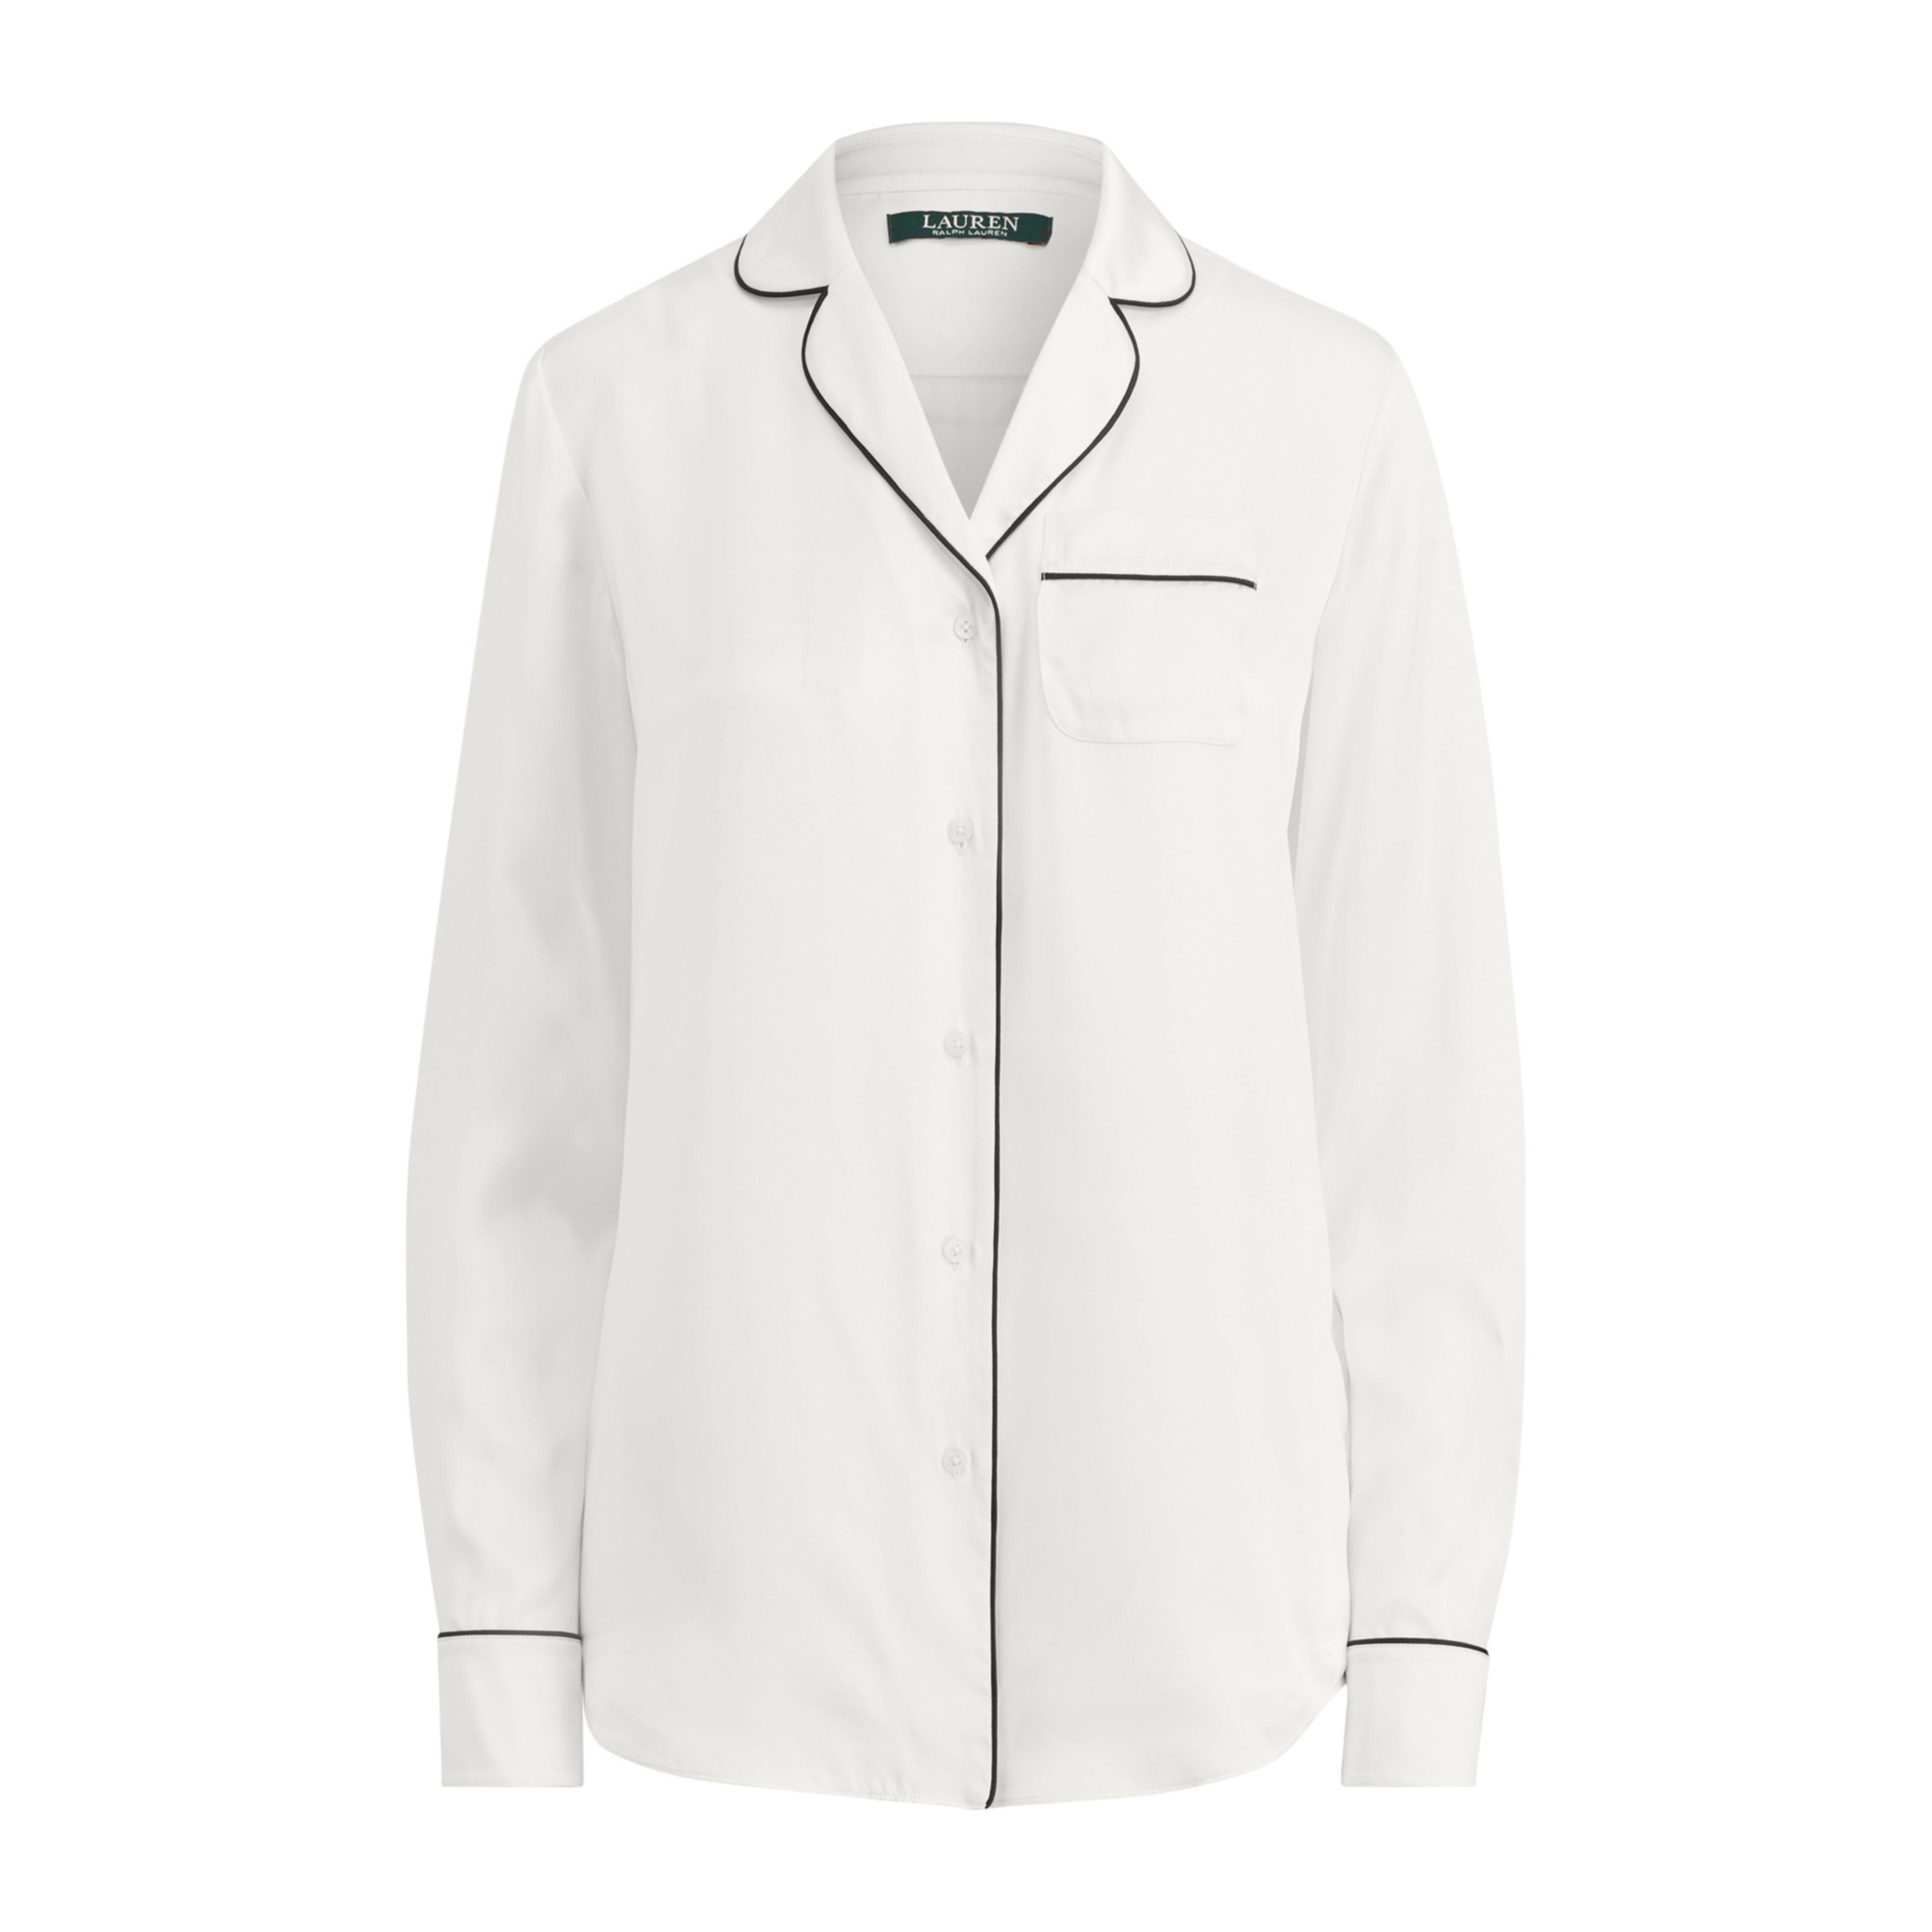 57691fdf9d Lyst - Ralph Lauren Silk Charmeuse Pajama Shirt in White